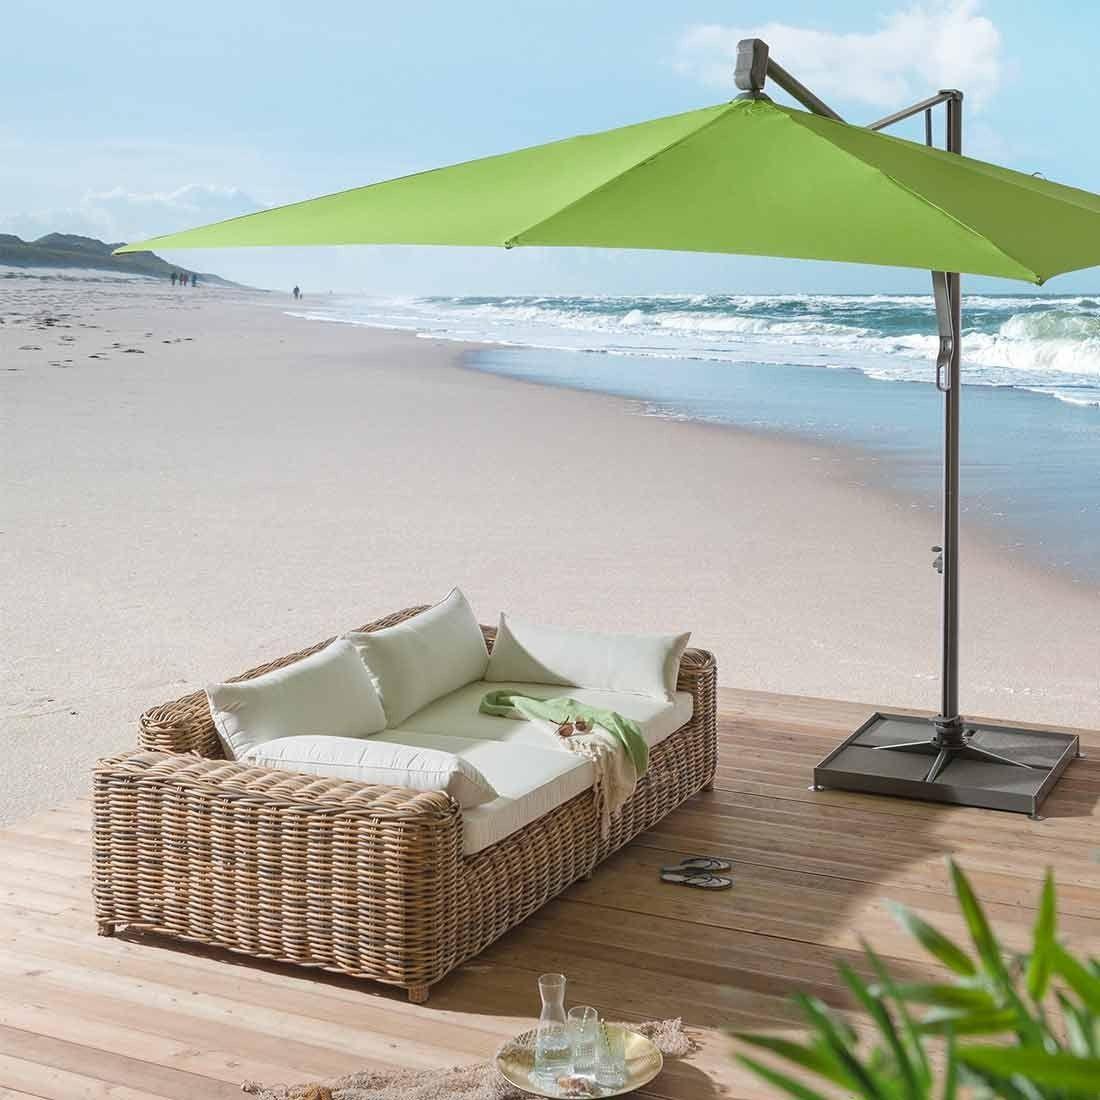 Outliv Versailles Luxury 2 Sitzer Sofa Geflecht In 2020 Rattan Lounge Mobel Lounge Mobel Und Rattan Mobel Garten